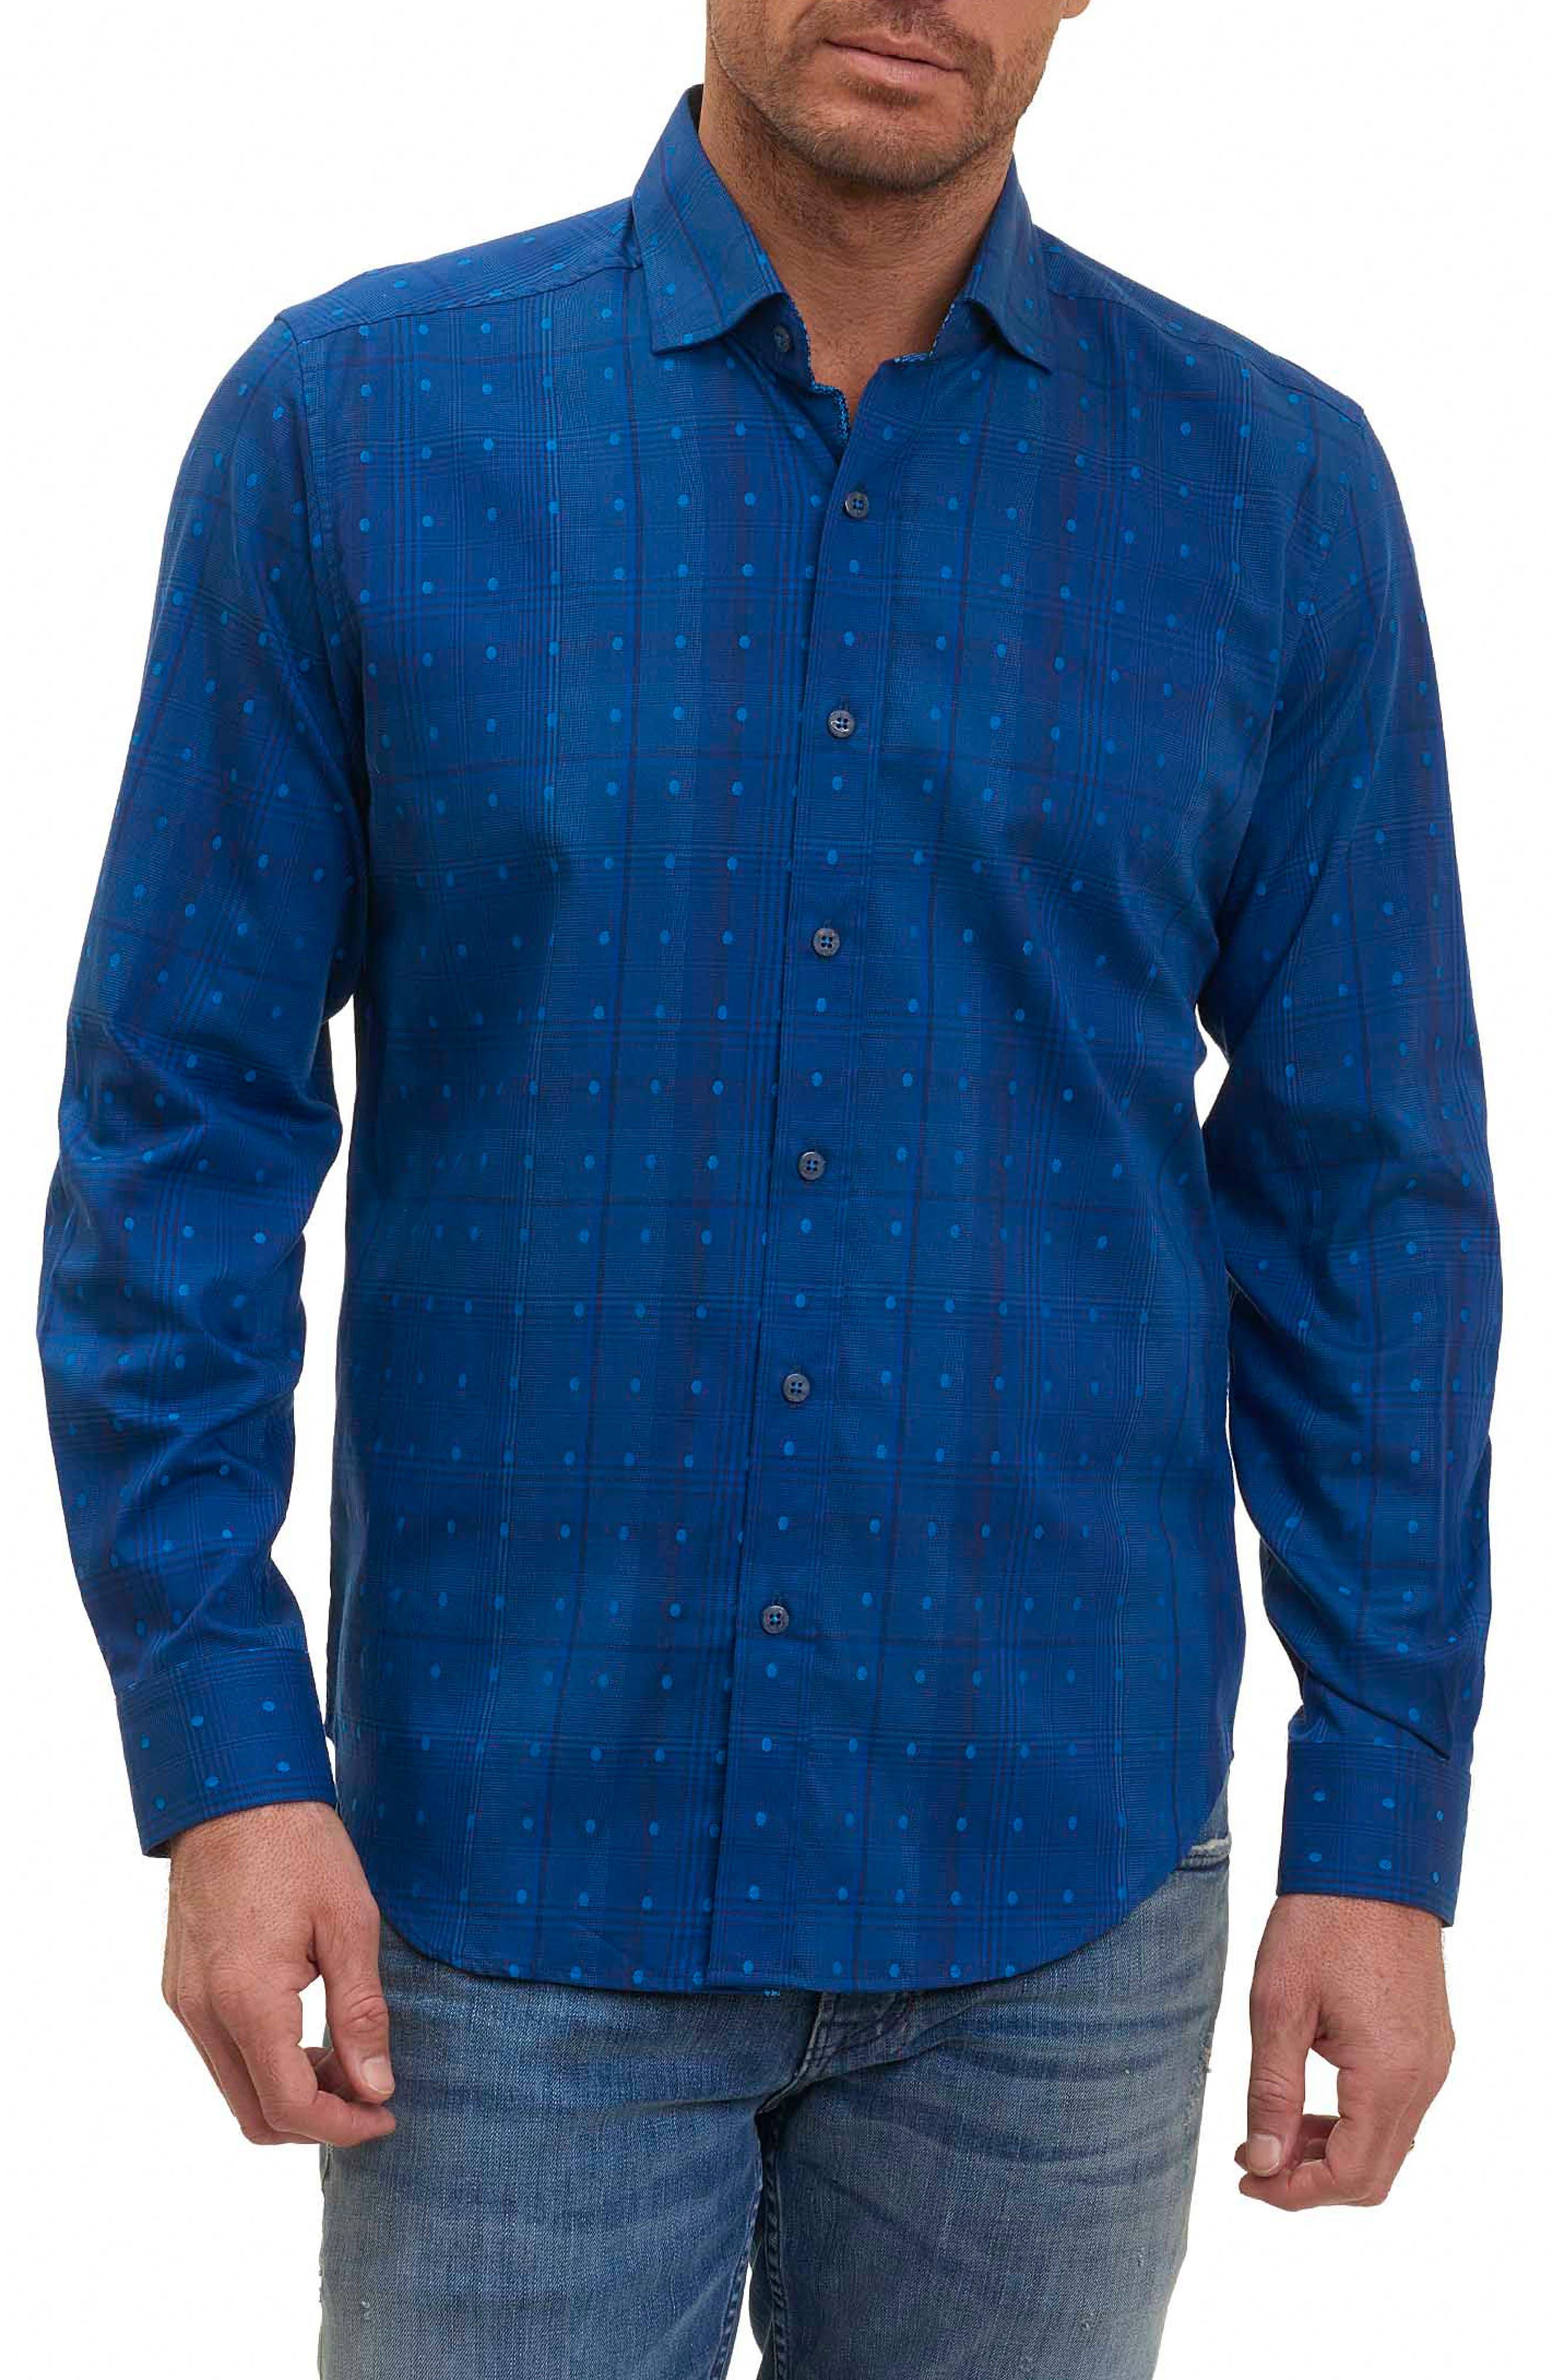 Alternate Image 1 Selected - Robert Graham Pete Tailored Fit Print Sport Shirt